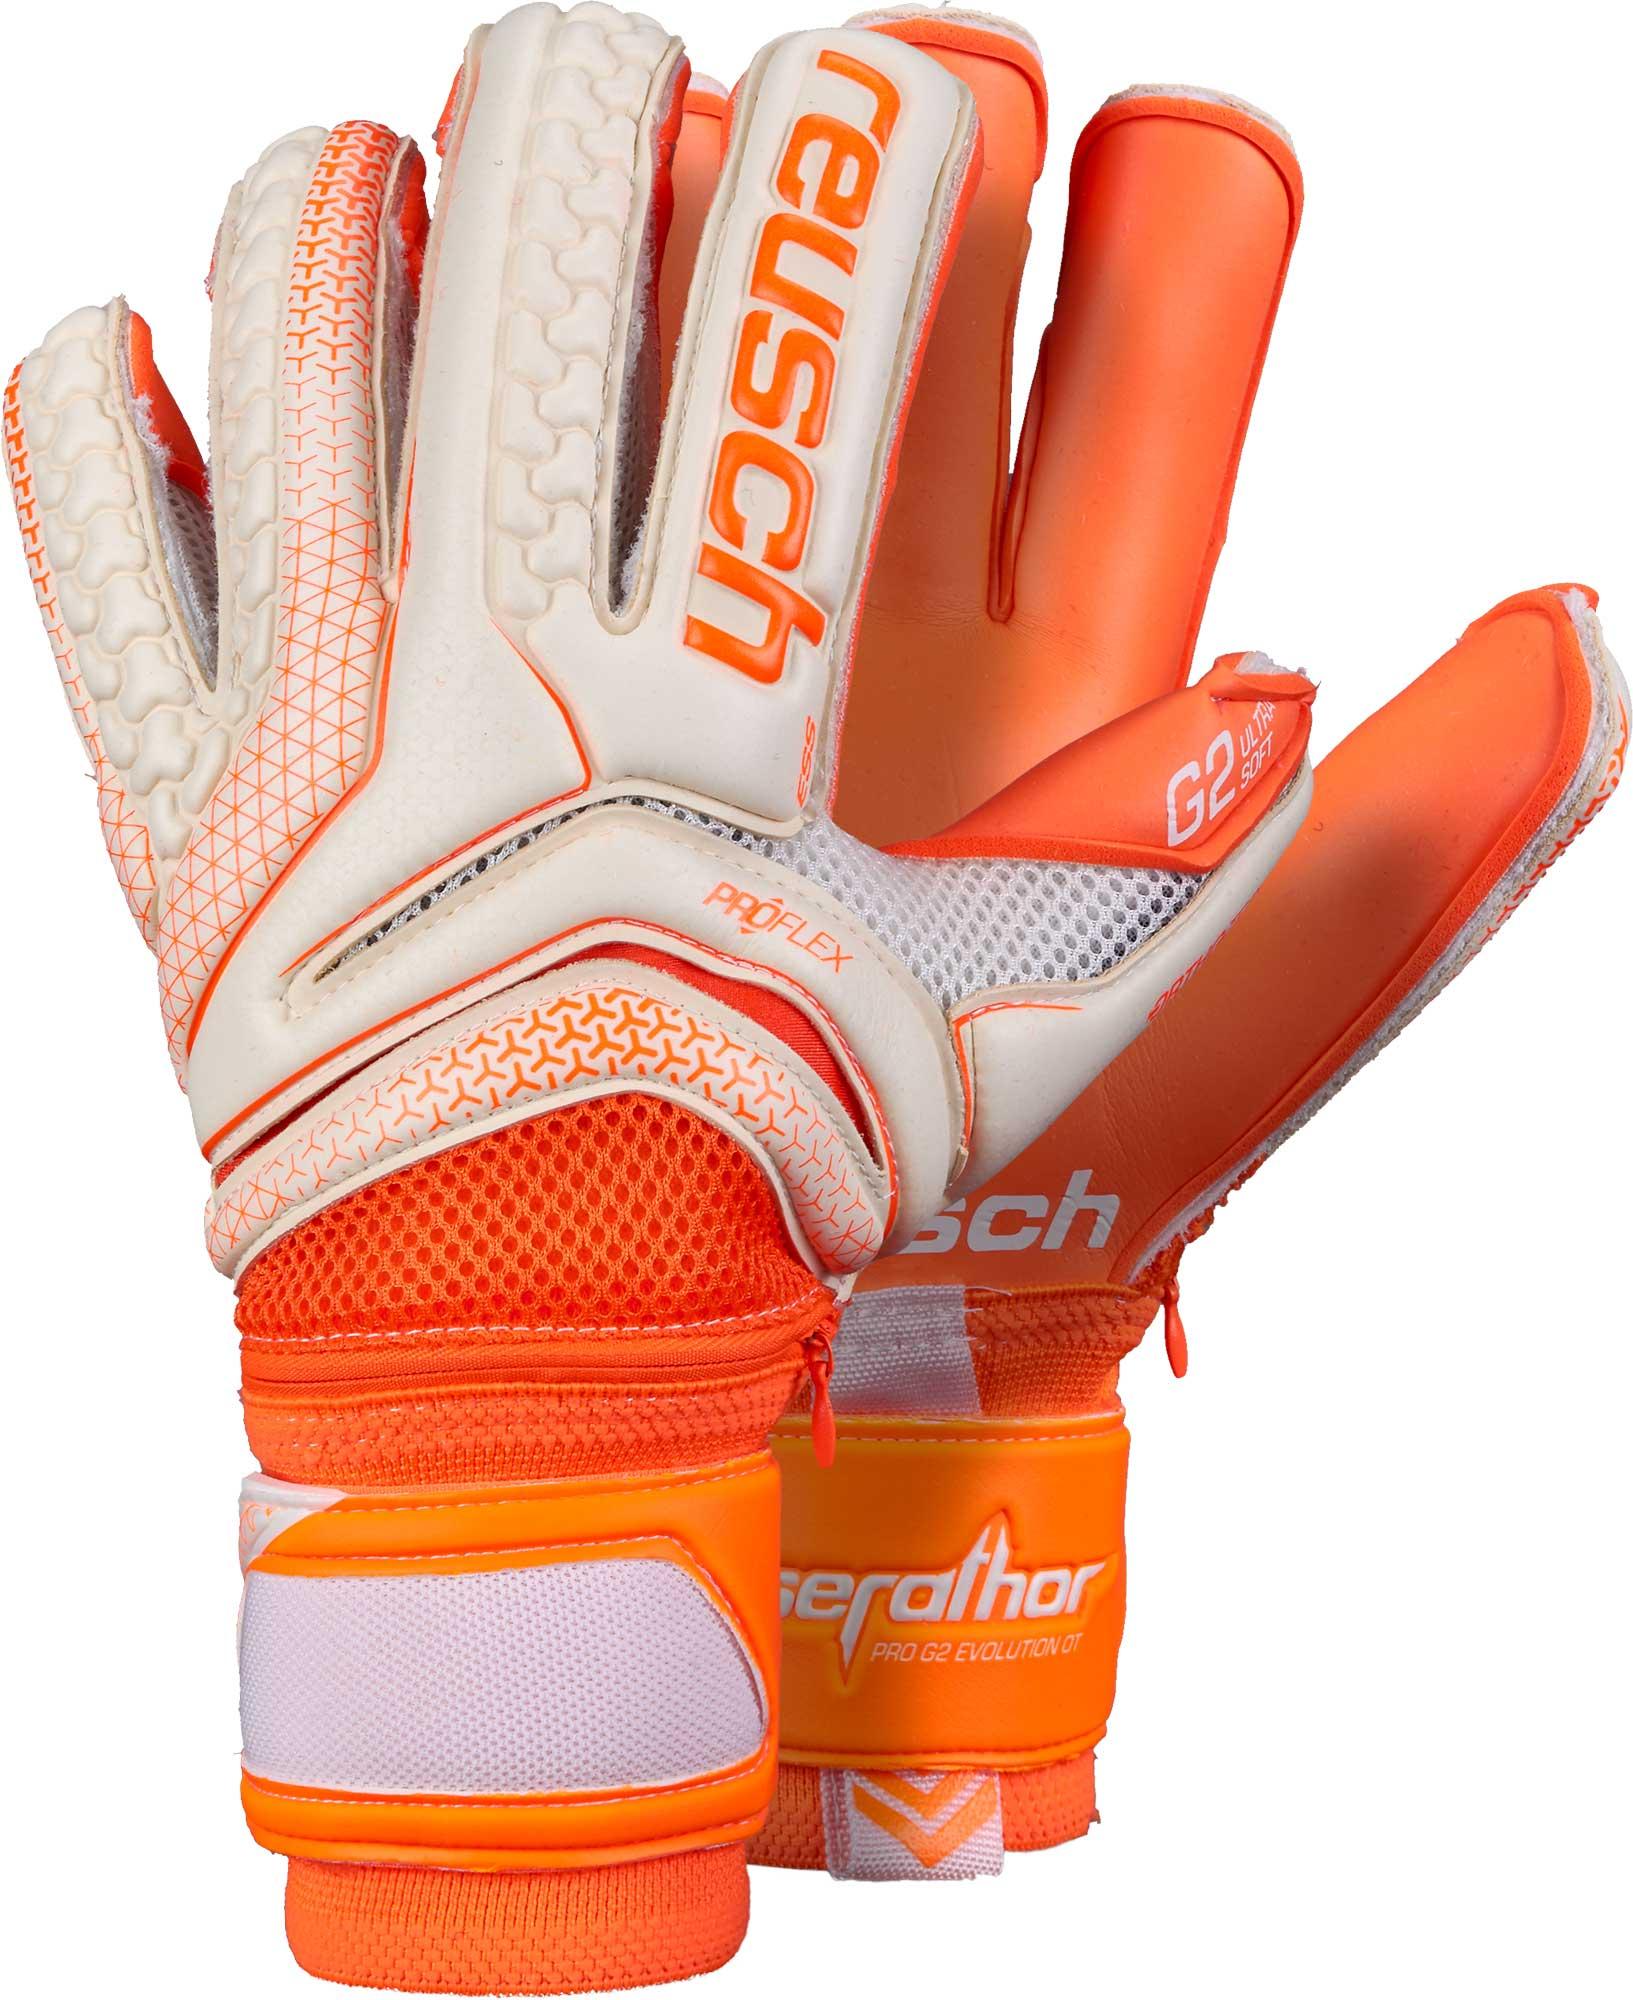 010fe4cf0 Reusch Serathor Pro G2 Evolution Ortho-Tec Goalkeeper Gloves – White &  Shocking Orange